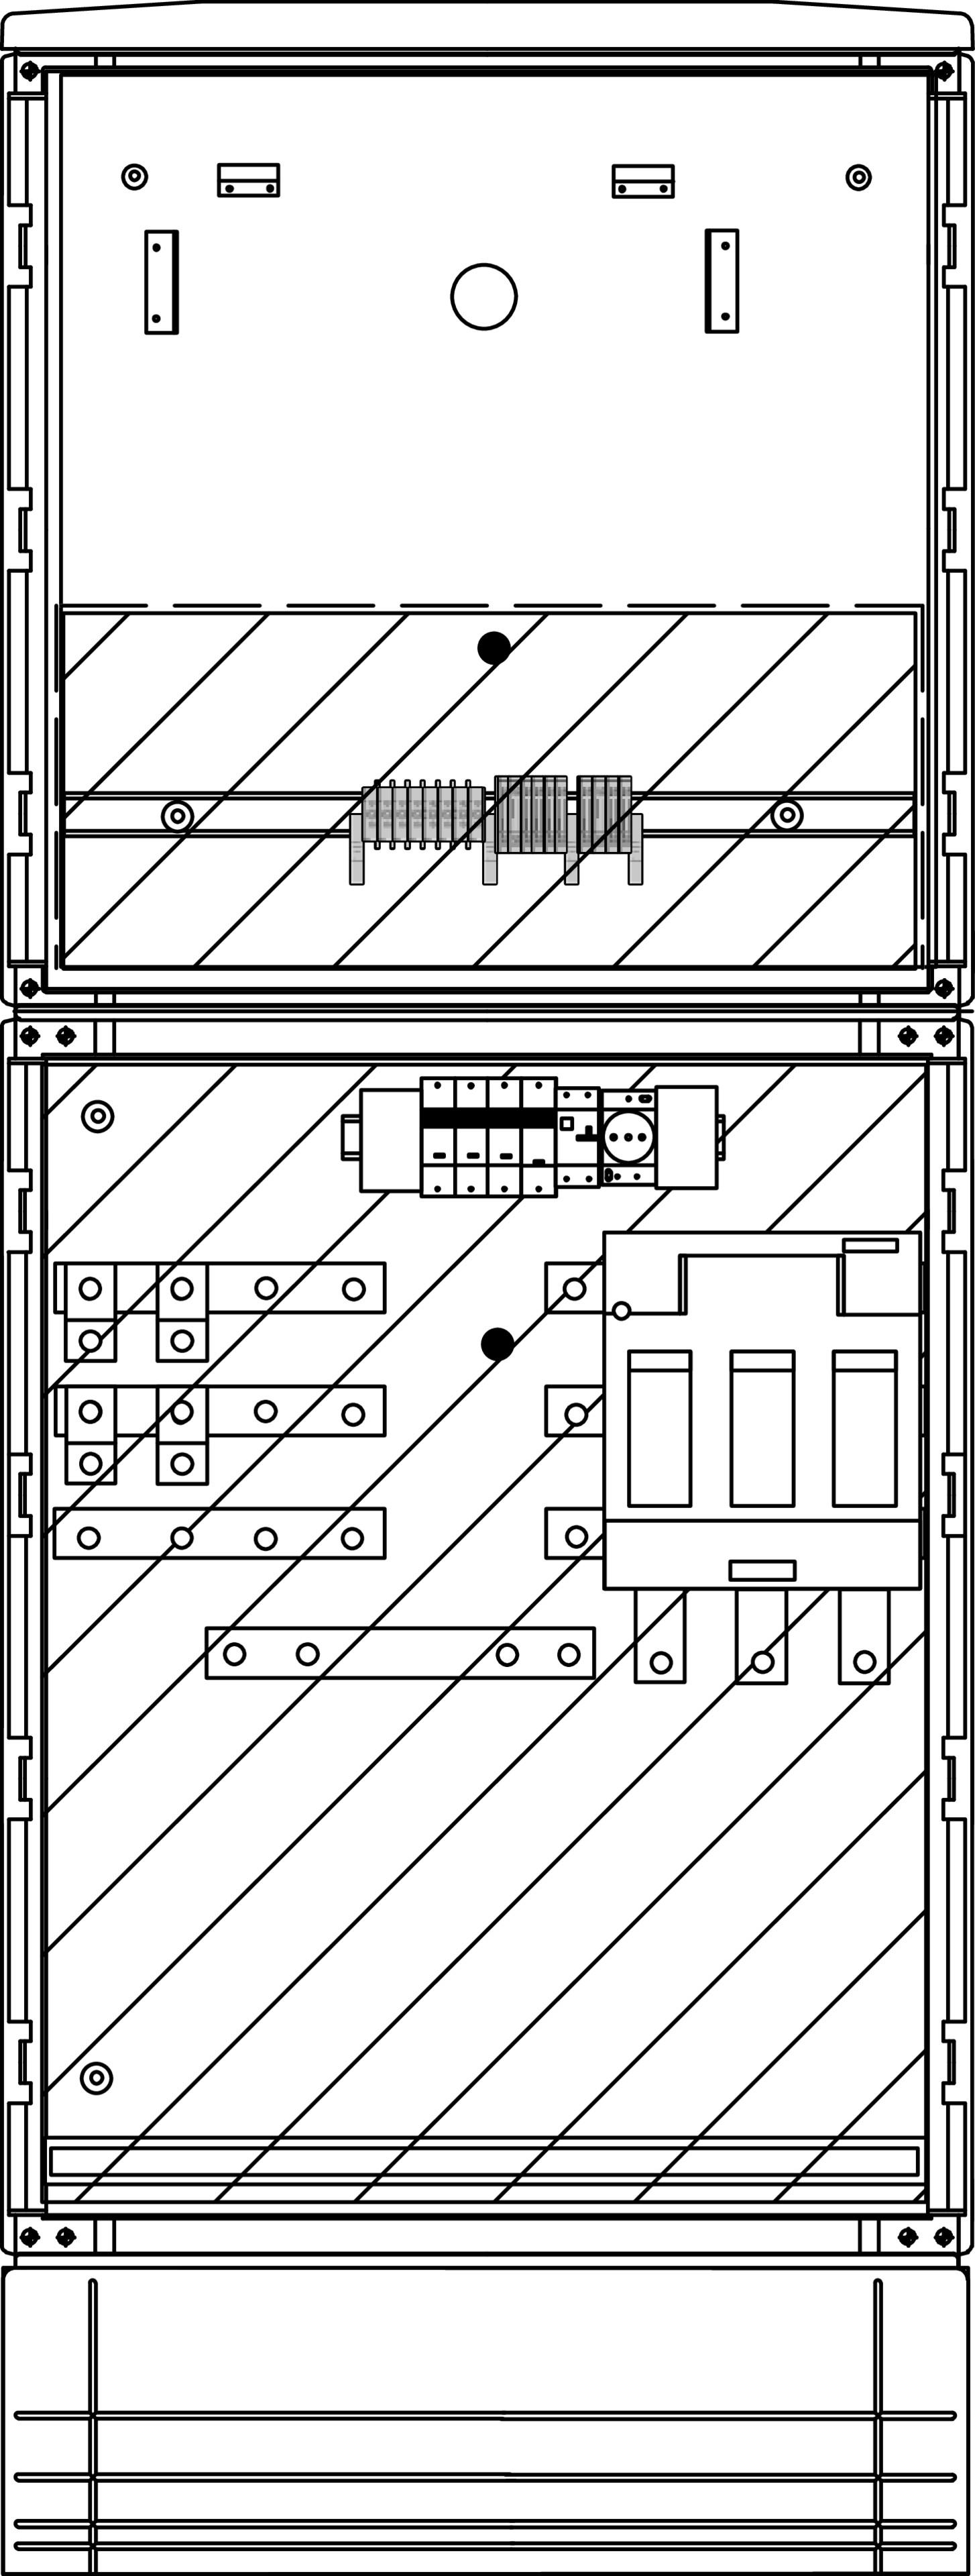 1 Stk Messwandler 630A innen mit Sockel IL190252--